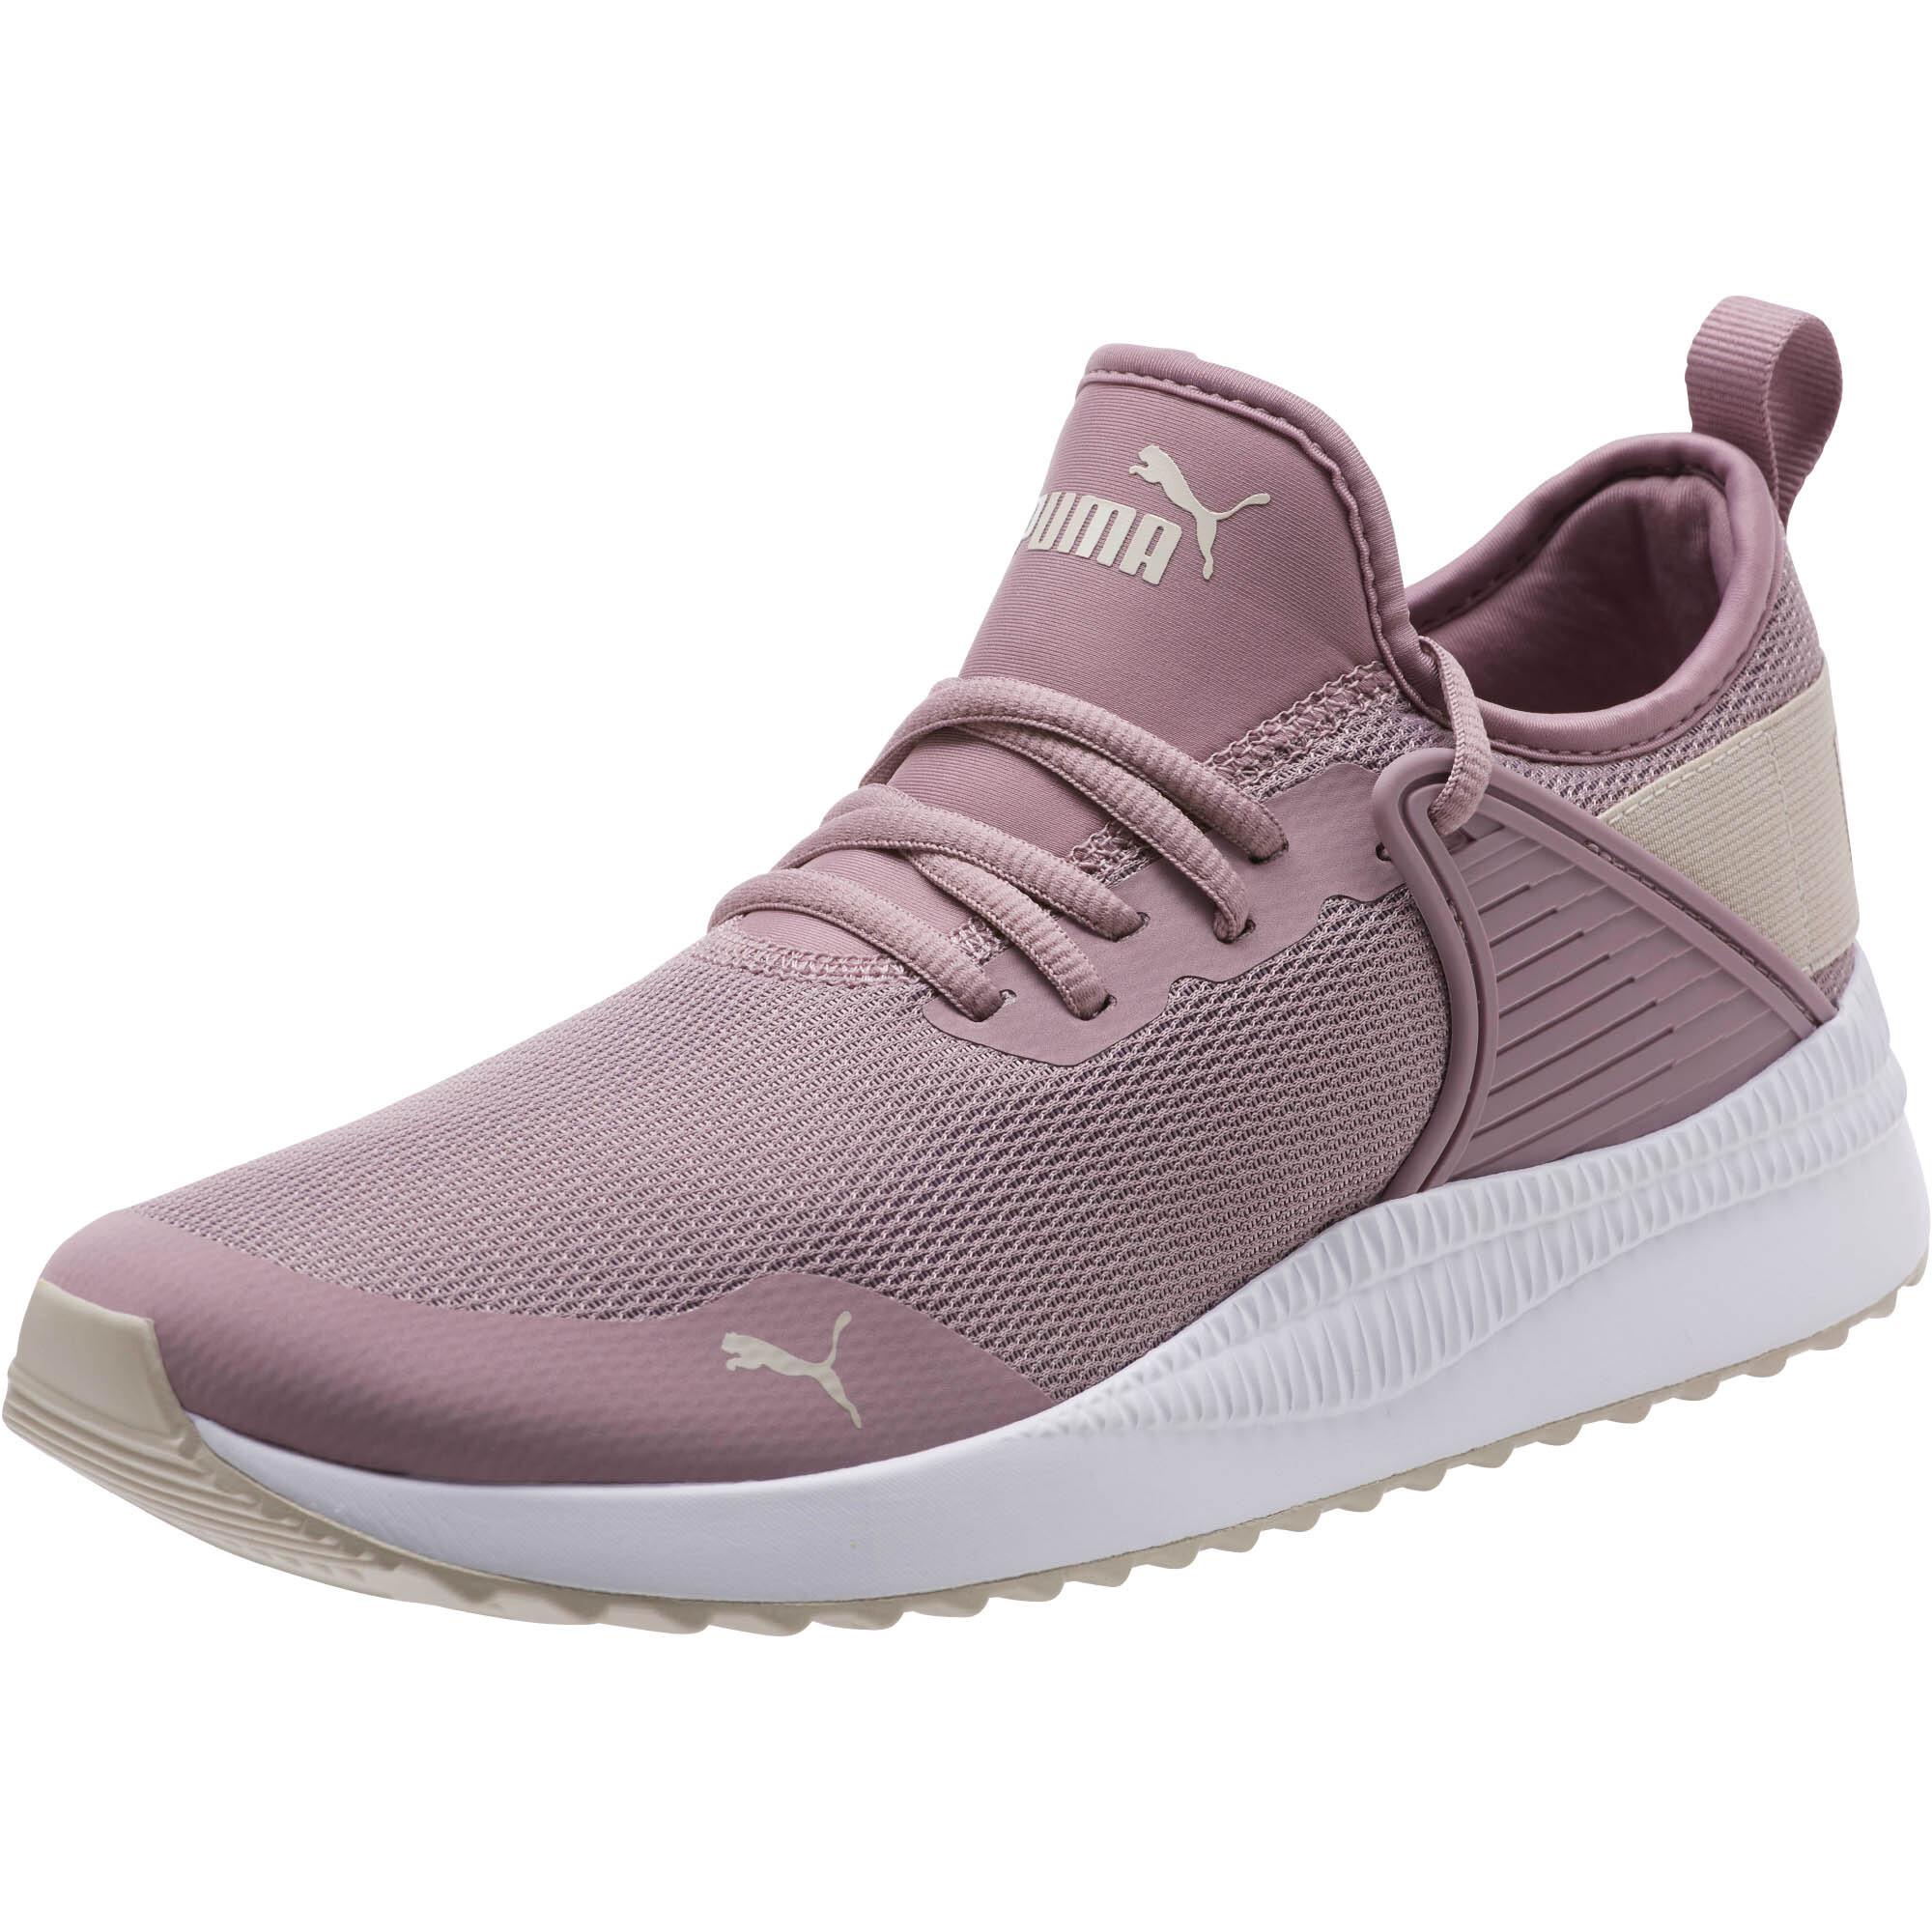 PUMA-Pacer-Next-Cage-Sneakers-Men-Shoe-Basics thumbnail 19